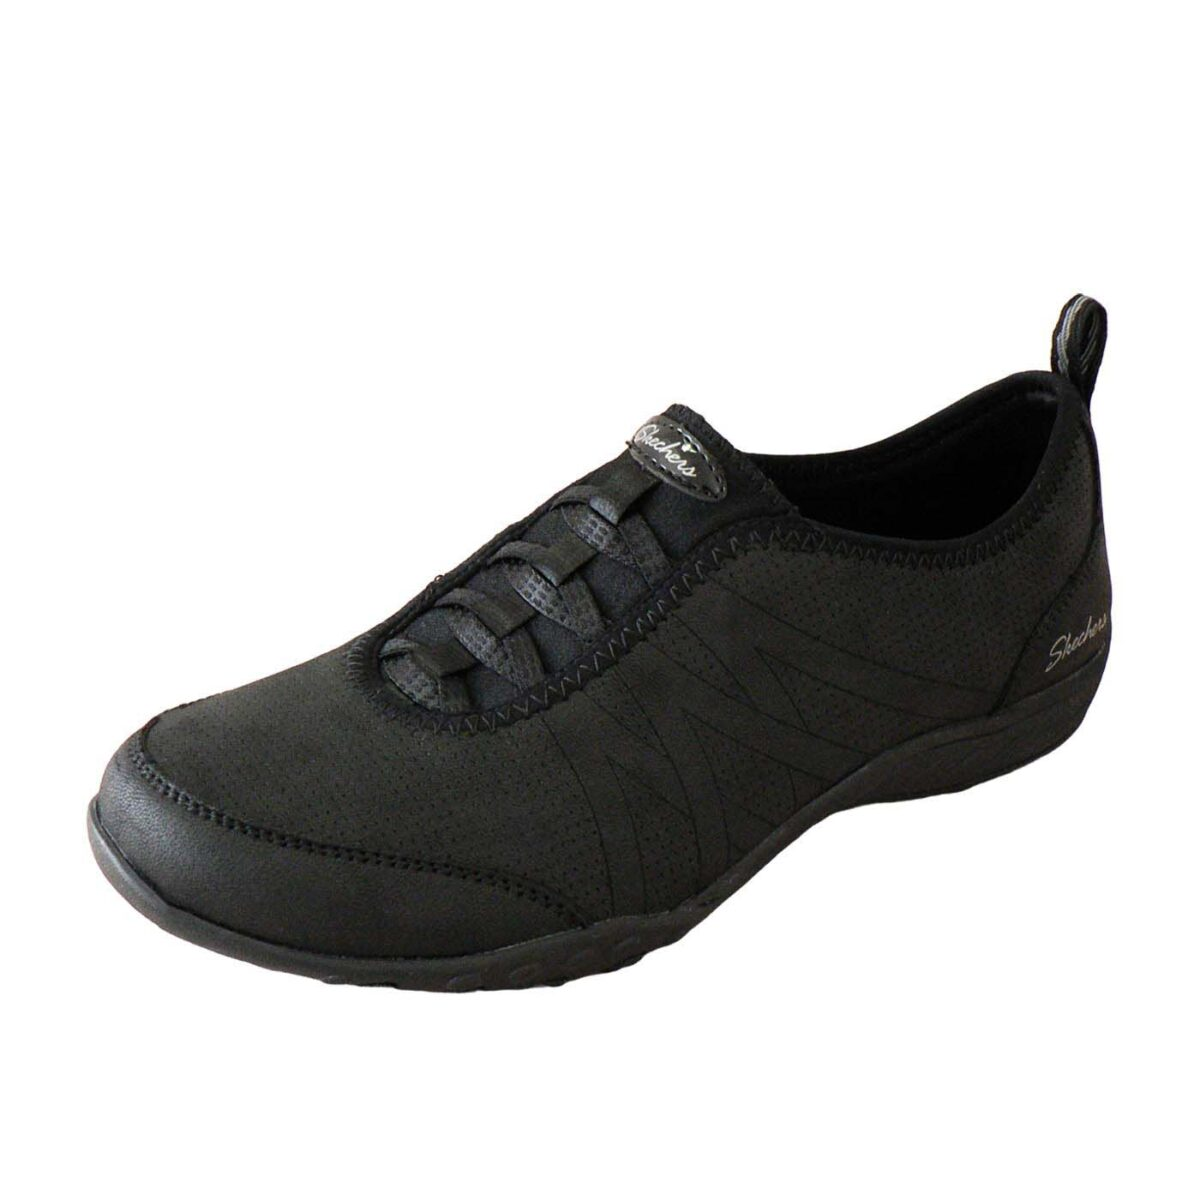 Skechers Breath Easy 100214 Black